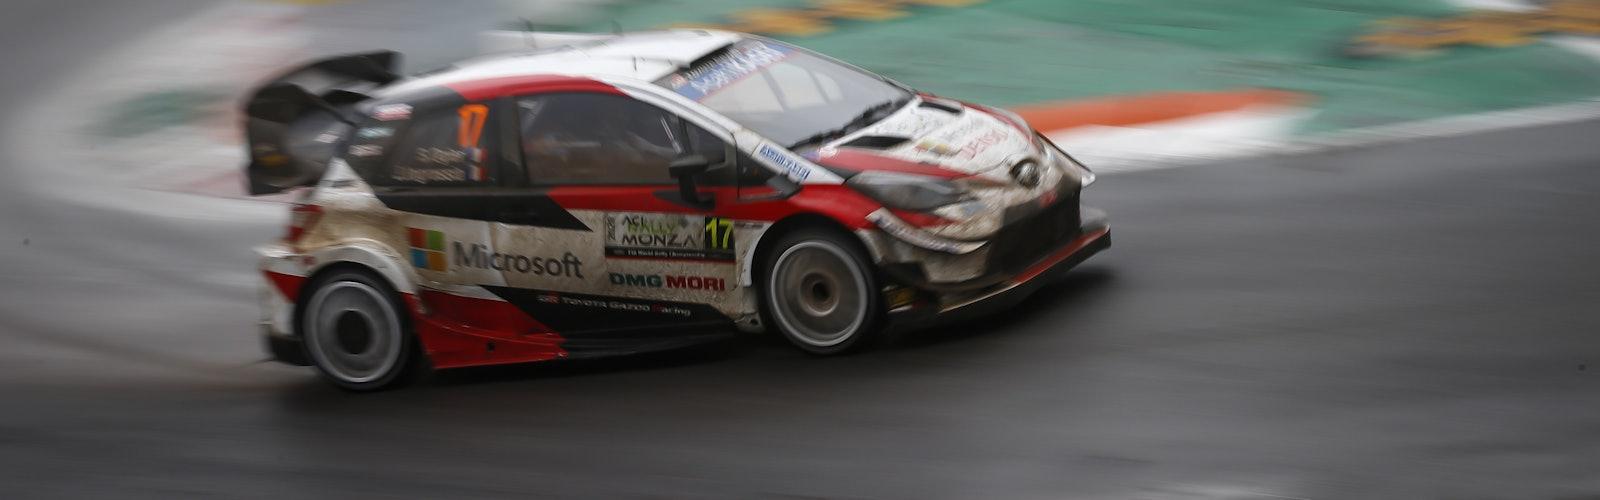 WRC_2020_Rd.7_186